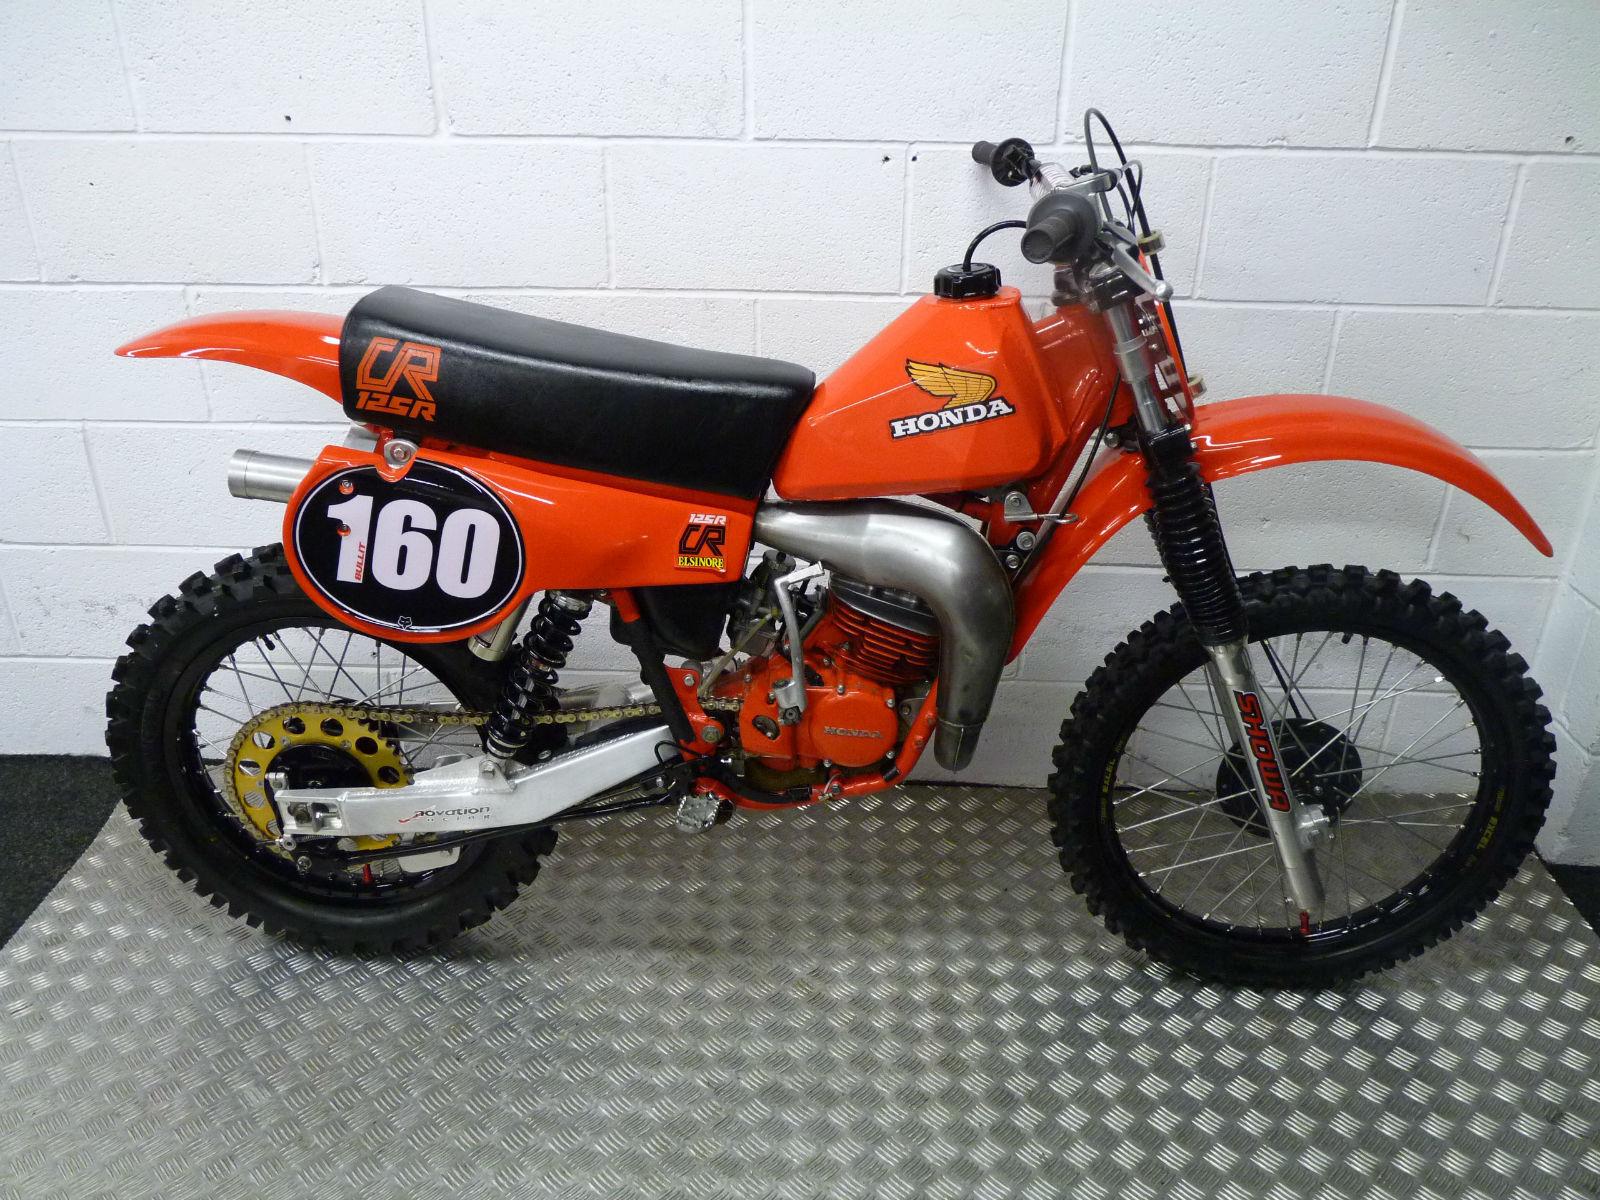 honda cr 125 1980 elsinore twinshock evo classic mx bike at craigs motorcycles. Black Bedroom Furniture Sets. Home Design Ideas